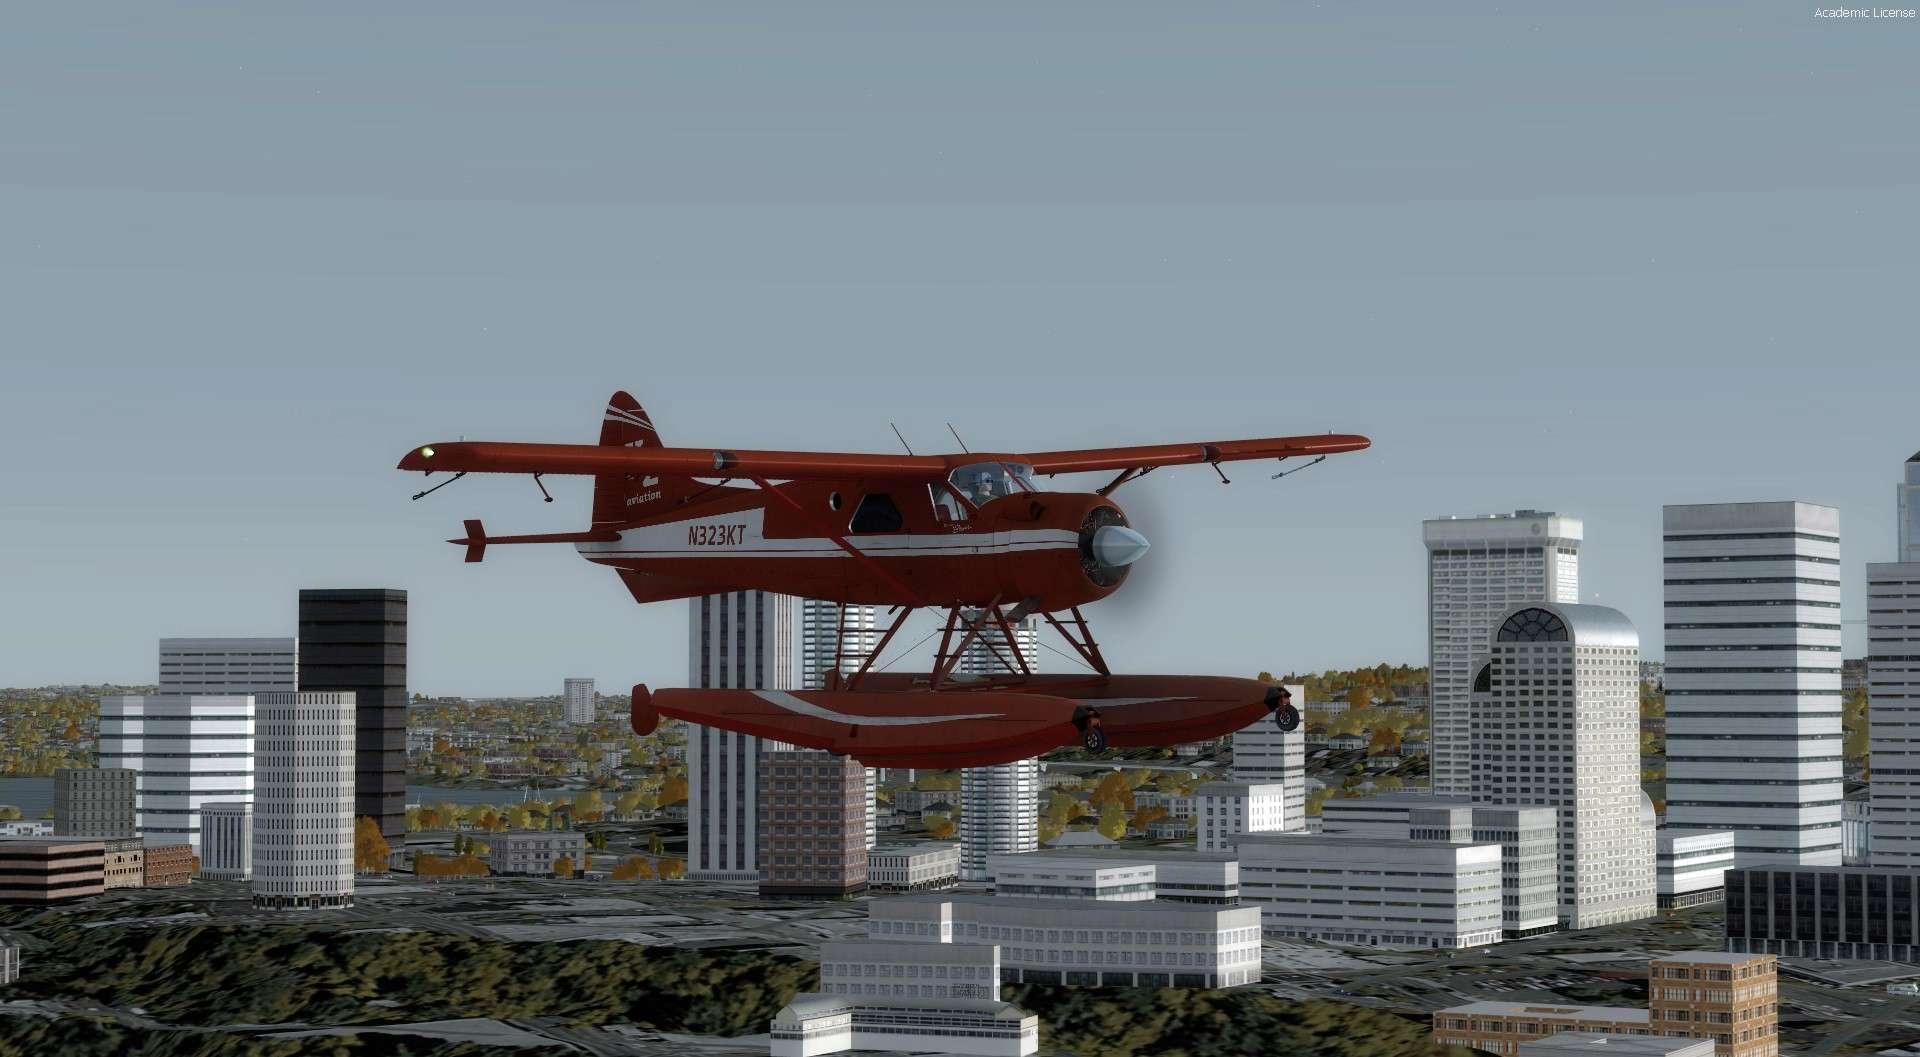 Compte rendu du vol Kenmore Air Harbor (W55) à Kenmore Air Harbor (W55) 2017-110